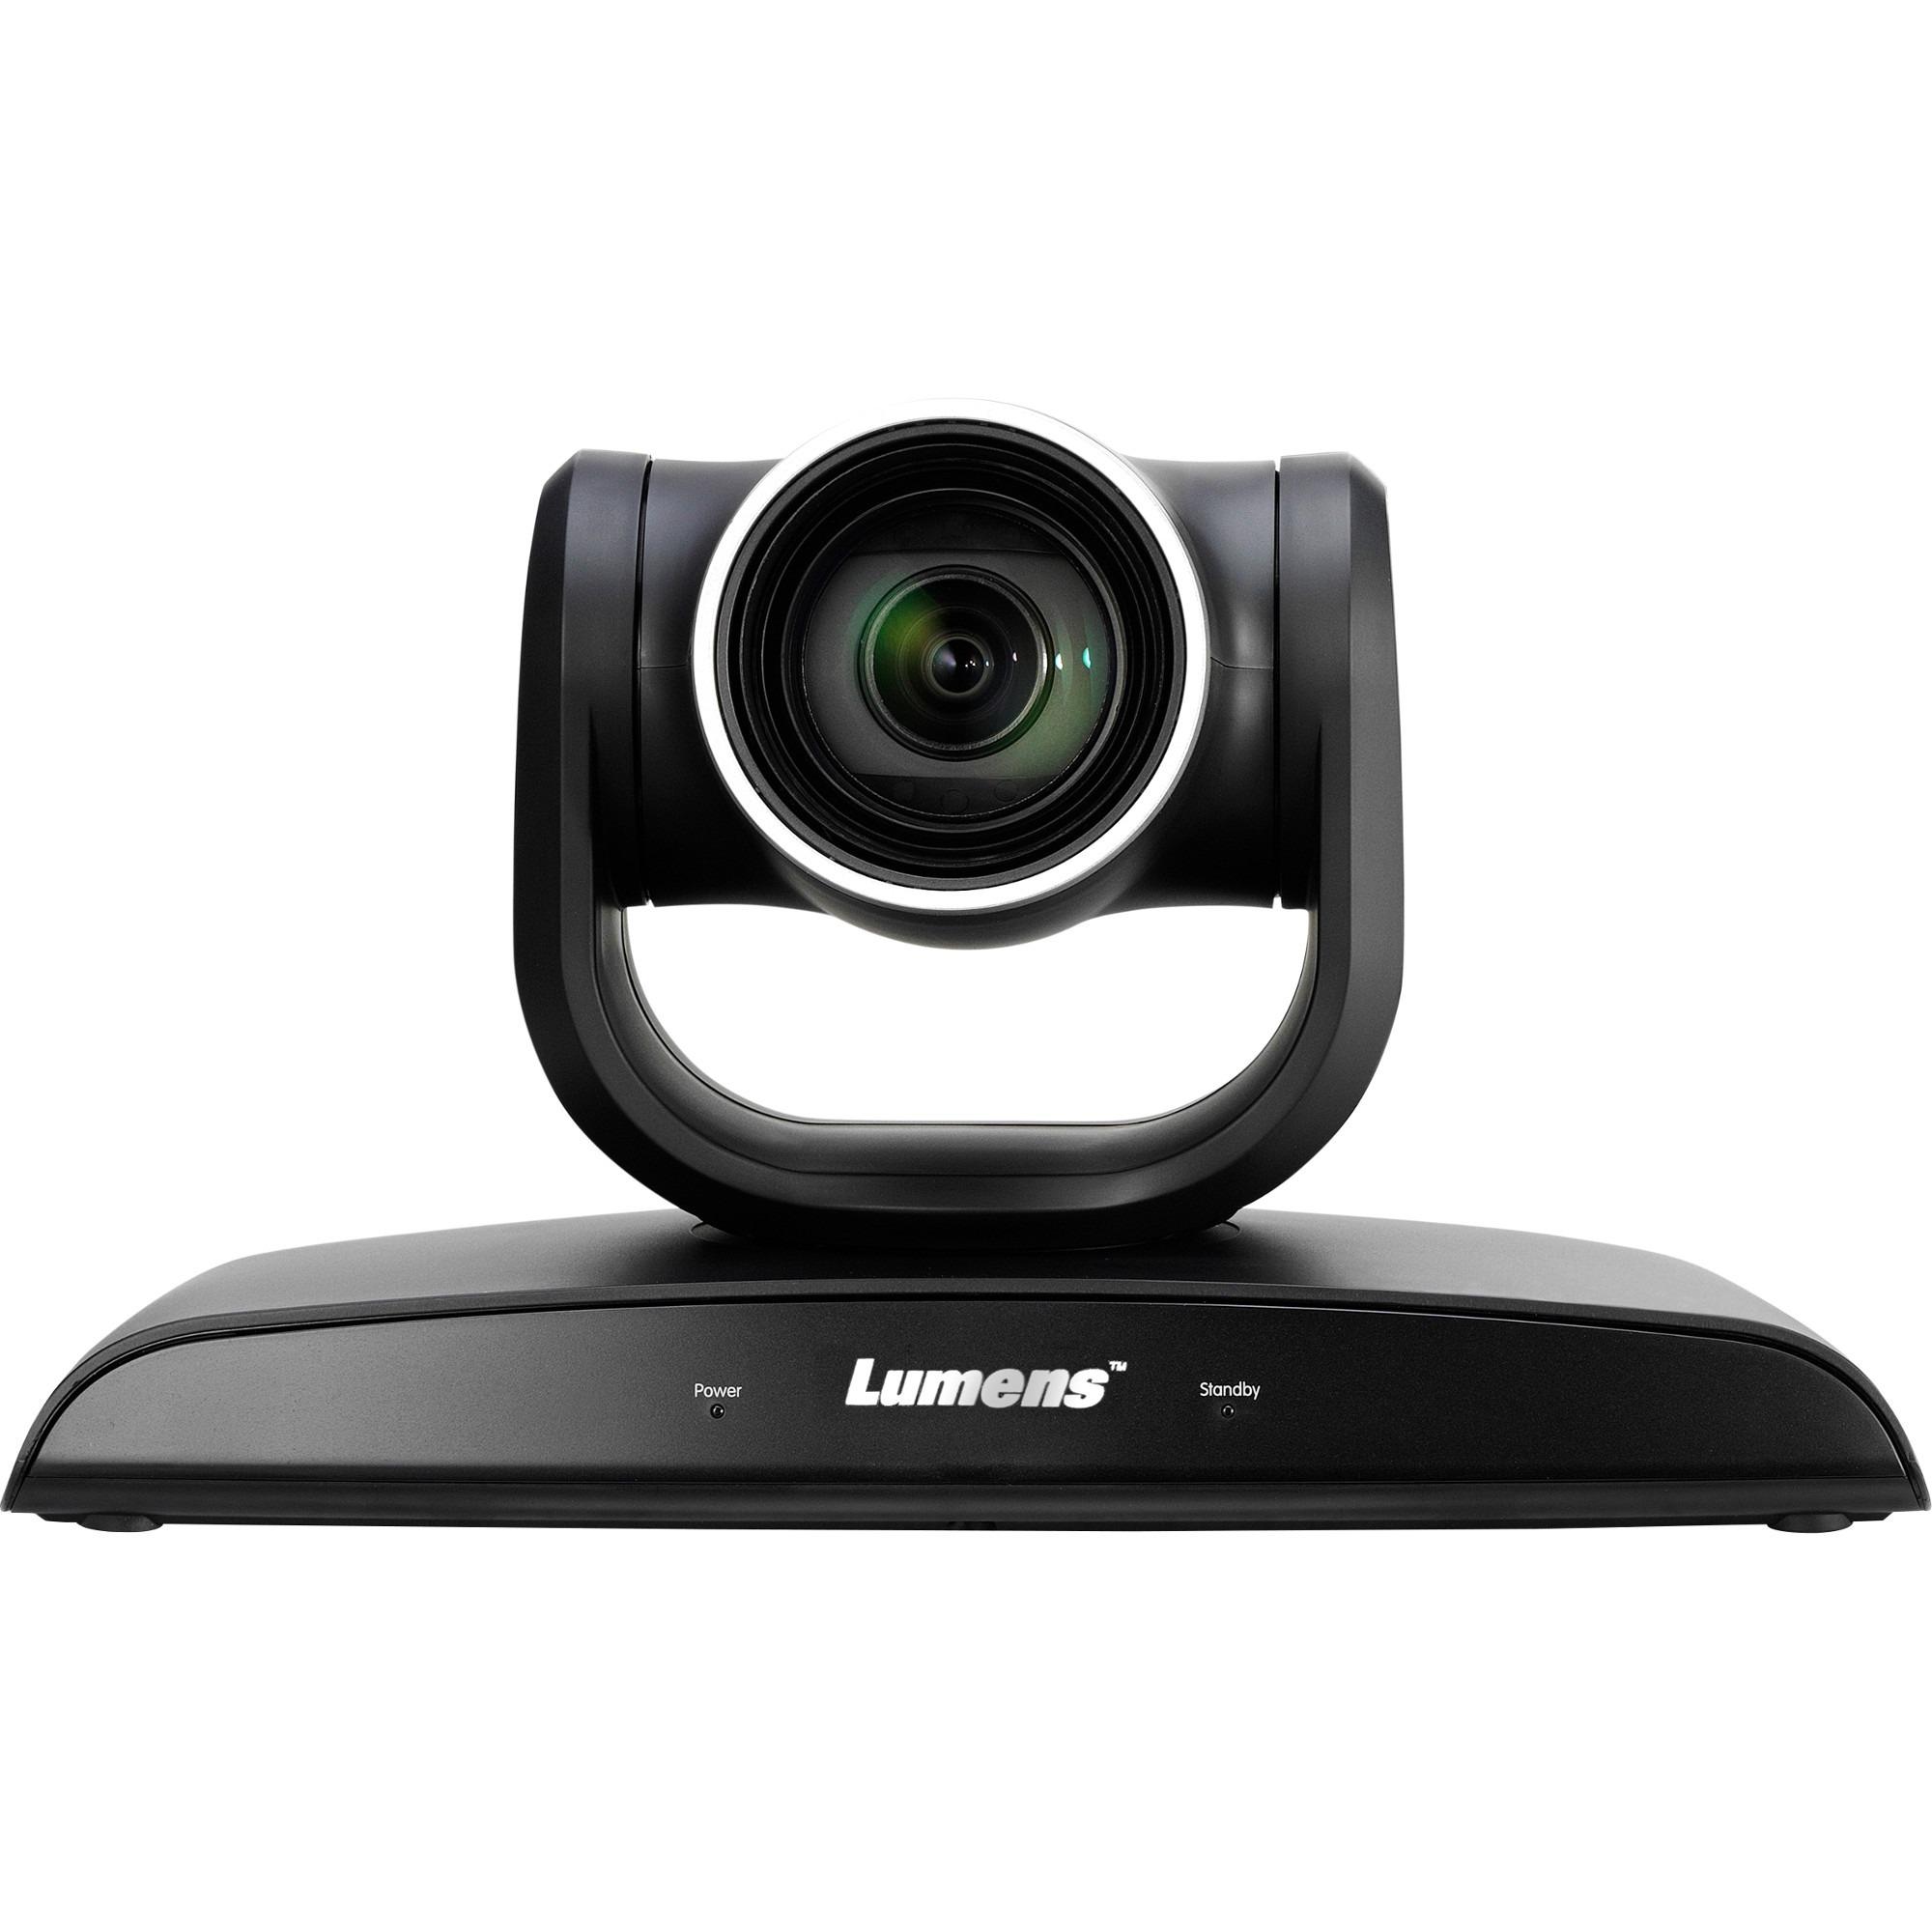 Lumens VC-B30U Video Conferencing Camera - 2 Megapixel - 60 fps - Black - USB 3.0_subImage_1